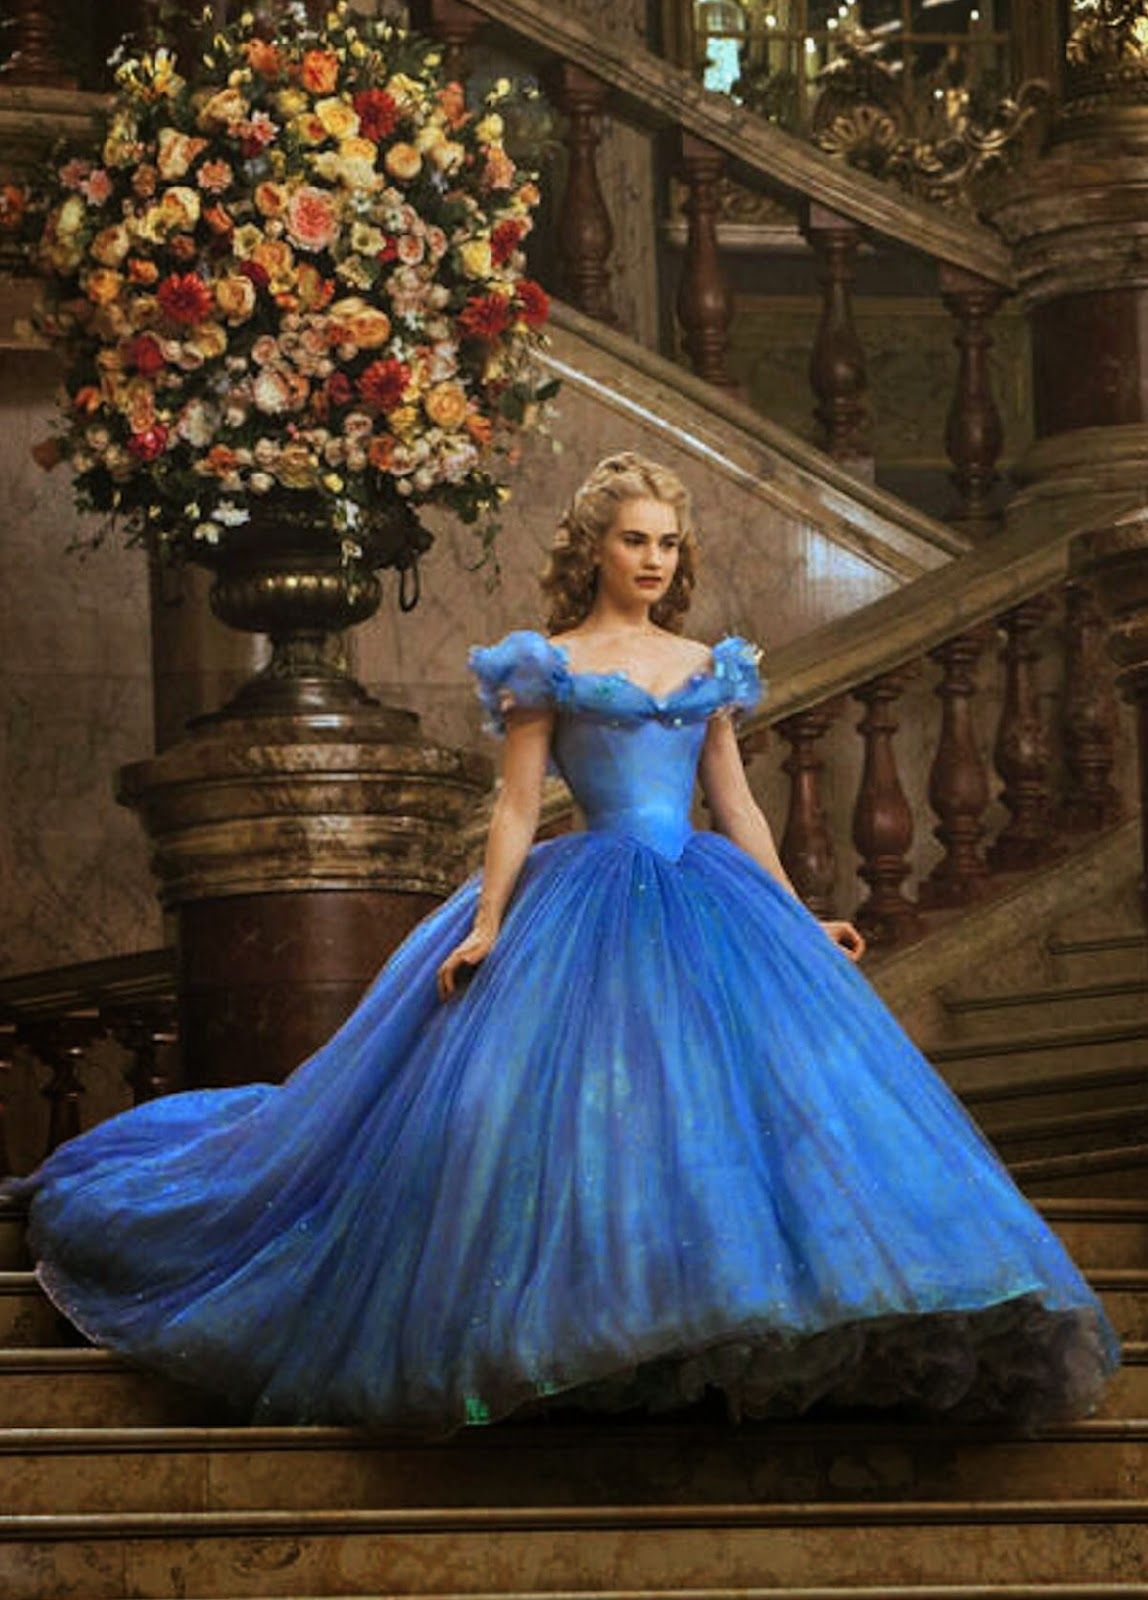 Cinderella 2015 Movie Putri Cantik Gaun Pesta Biru